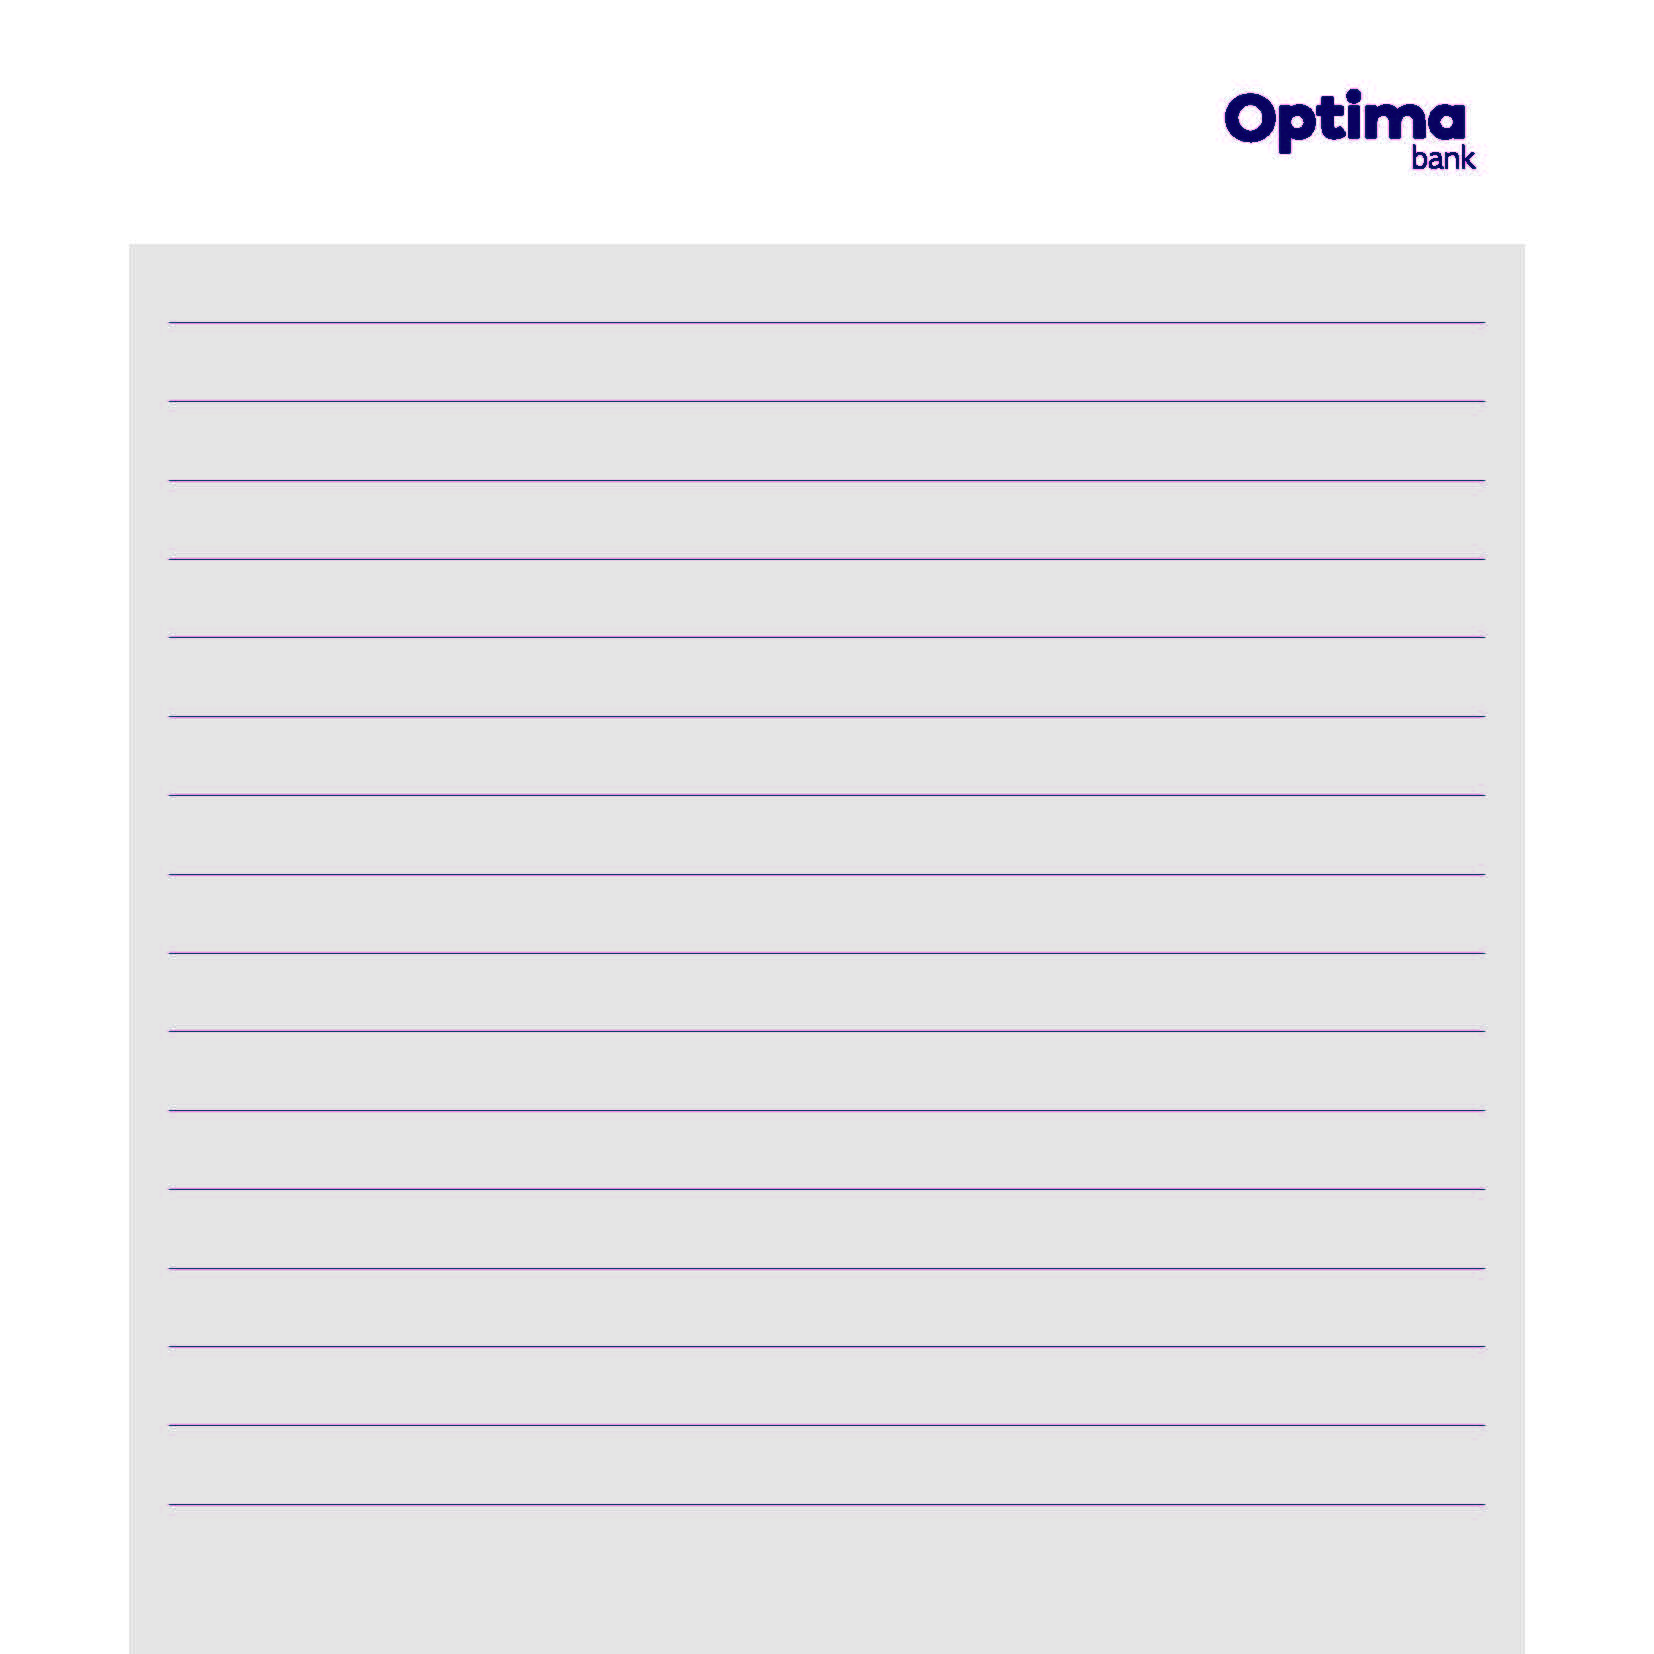 https://www.jib.gr/wp-content/uploads/2020/09/OPTIMA-BANK-BOOKLET-WEB_Page_099.jpg